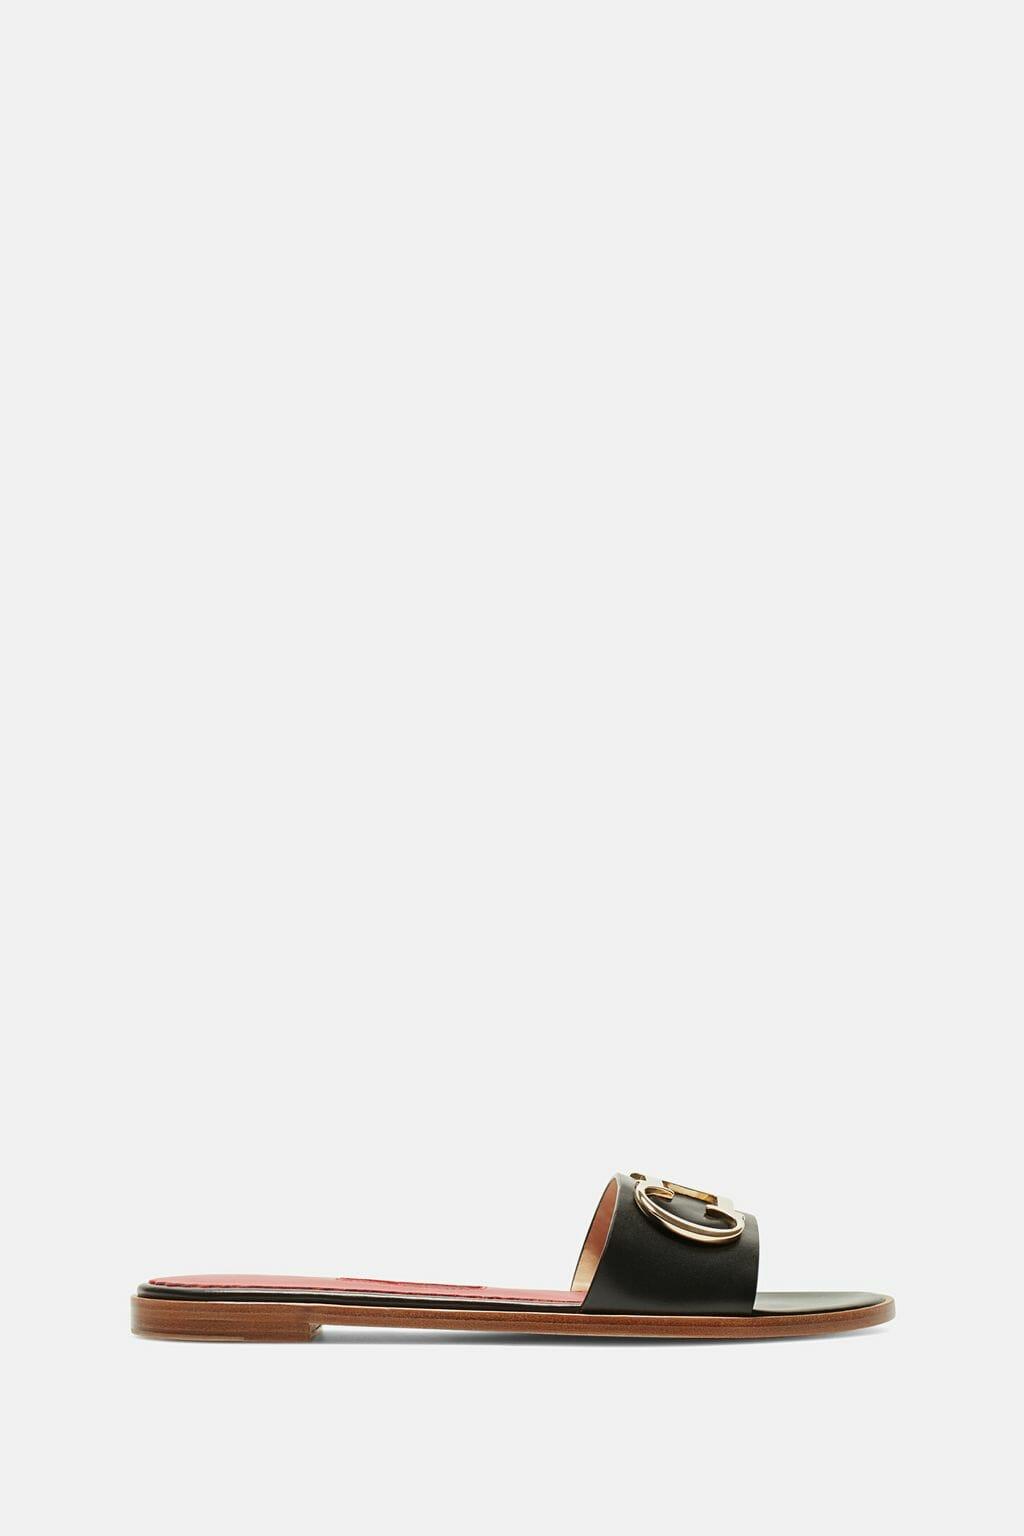 CH-Carolina-herrera-shoes-collection-Spring-Summer-2018-shoe-42